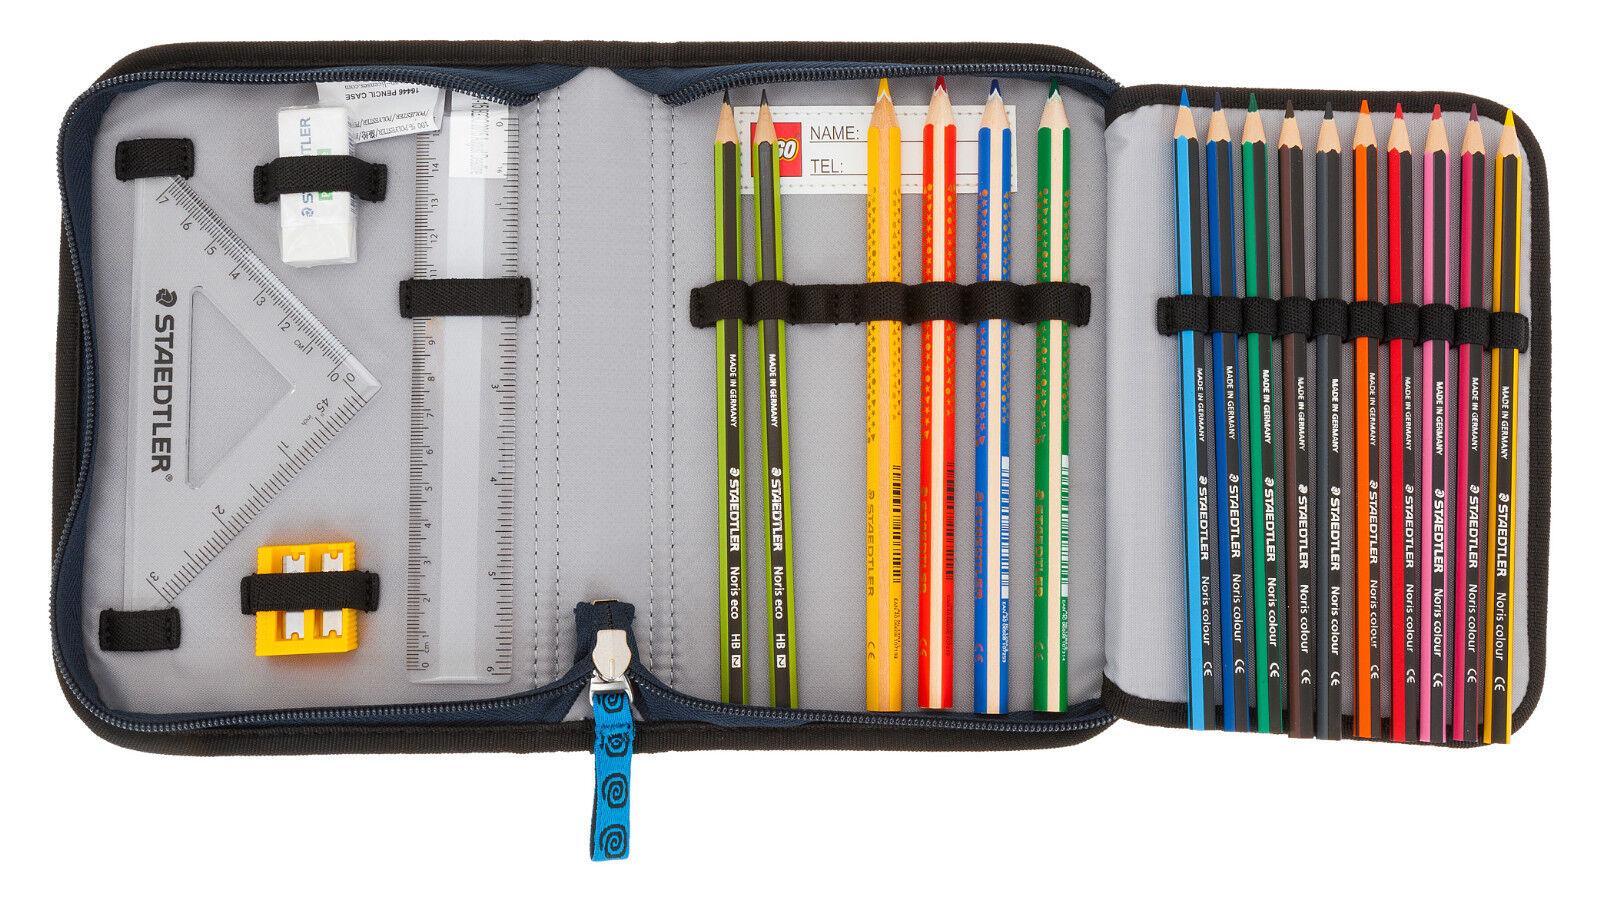 5 Teile Teile Teile Ranzen LEGO EASY Schulranzen Tornister 1-4.Klasse NEXO KNIGHTS Blau m bf 0e8843